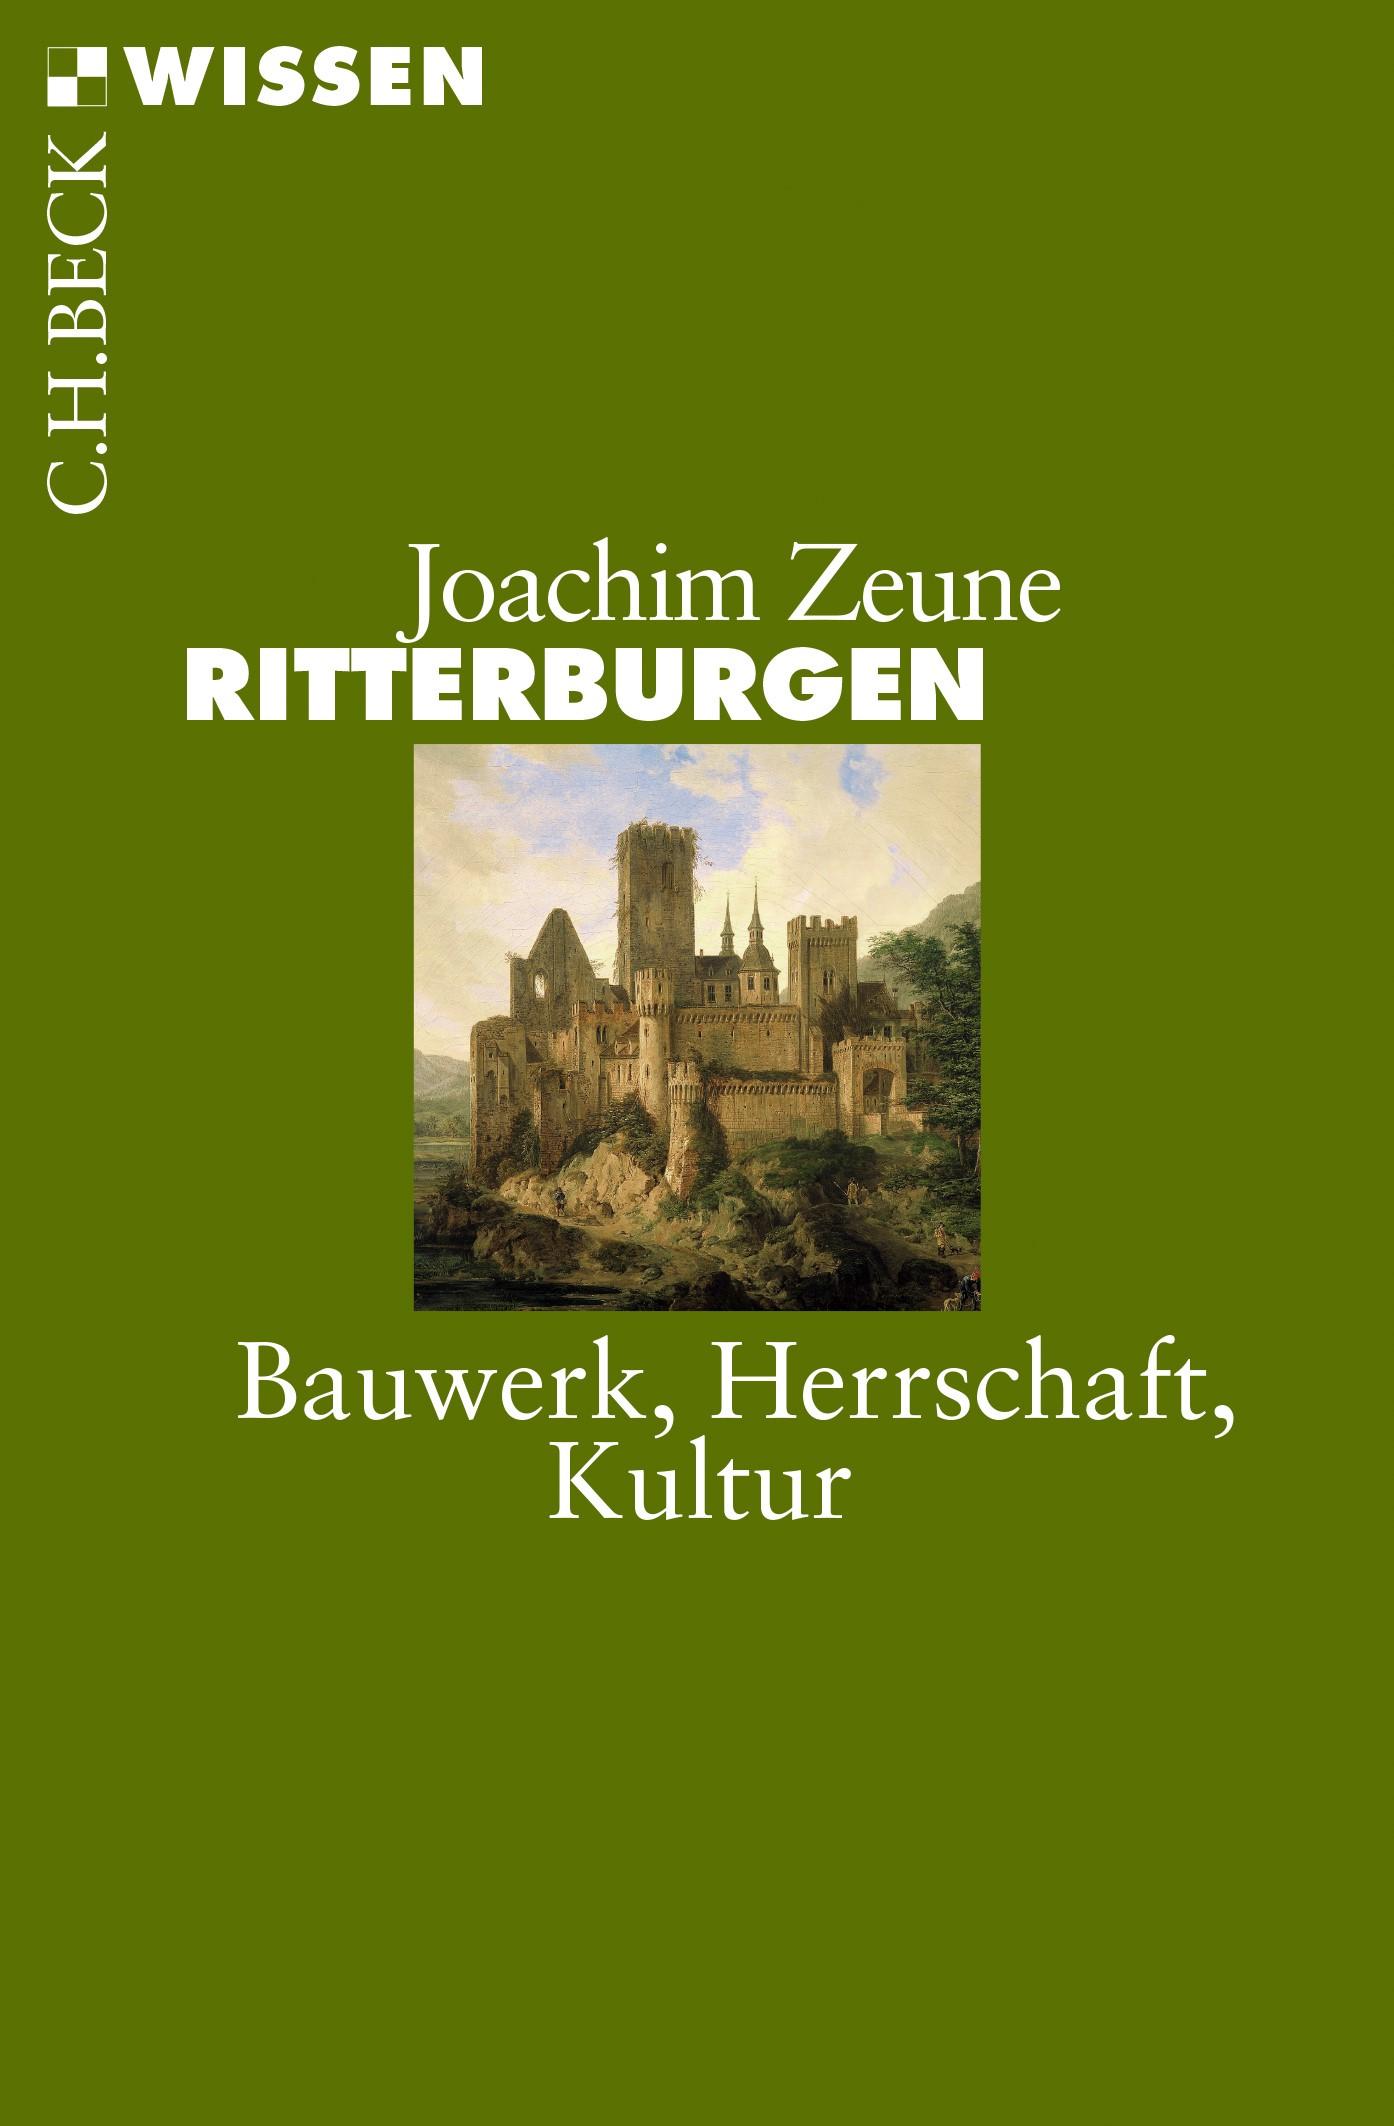 Cover des Buches 'Ritterburgen'